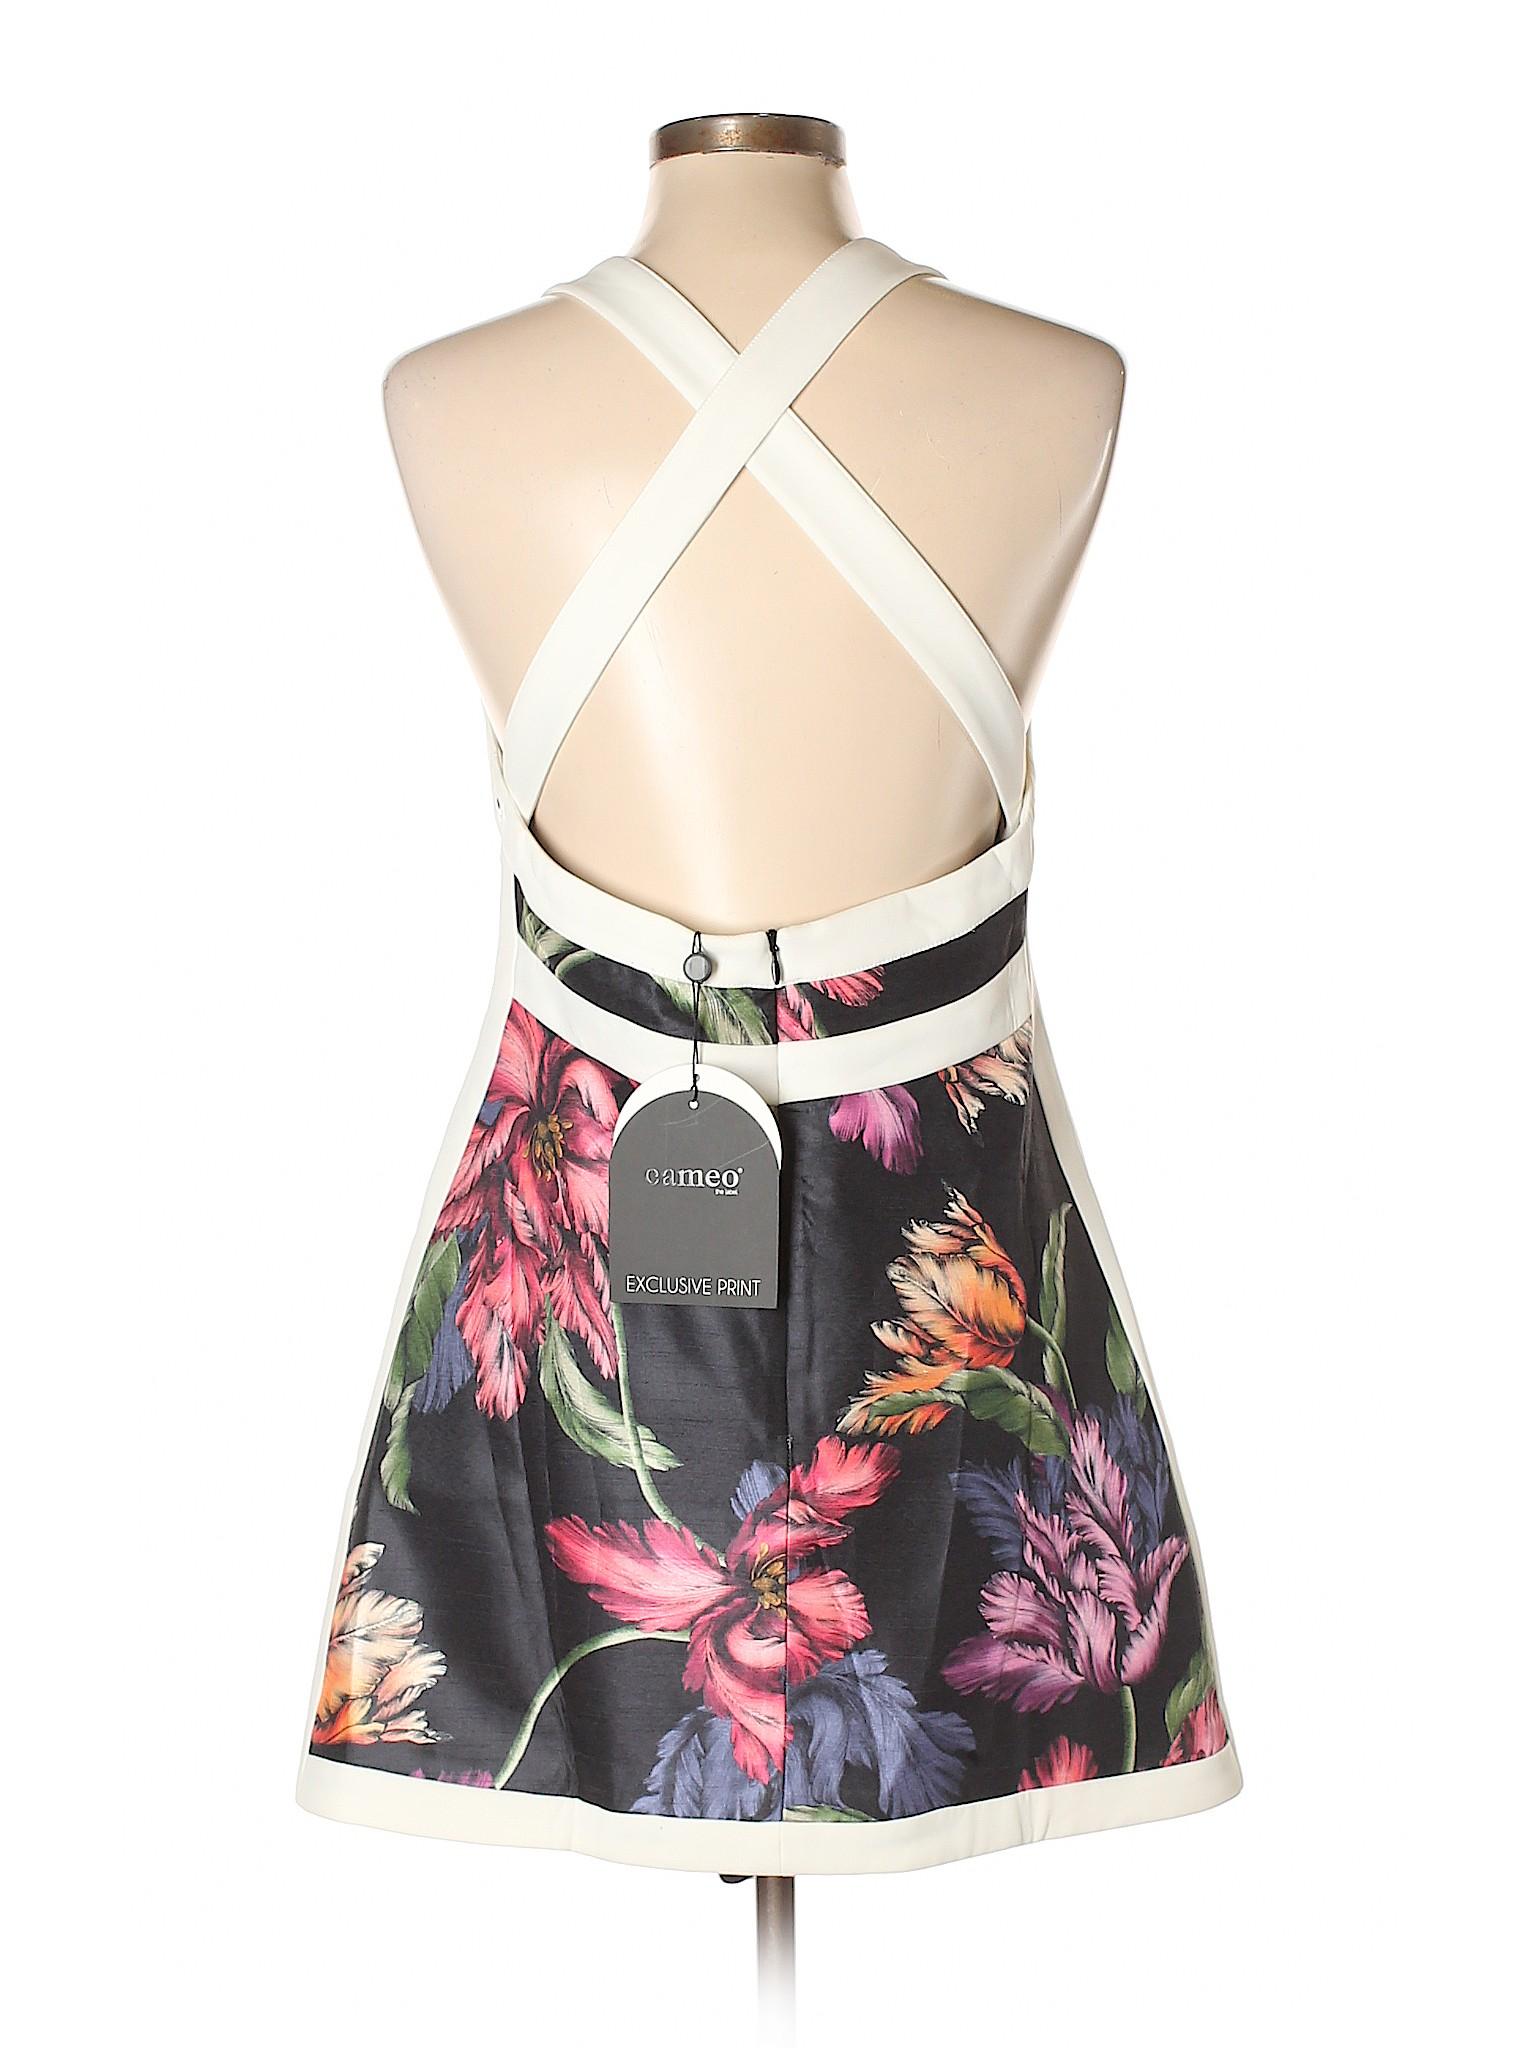 Cameo Boutique Boutique Boutique Cameo Dress Casual Dress winter winter Casual wq0FTv